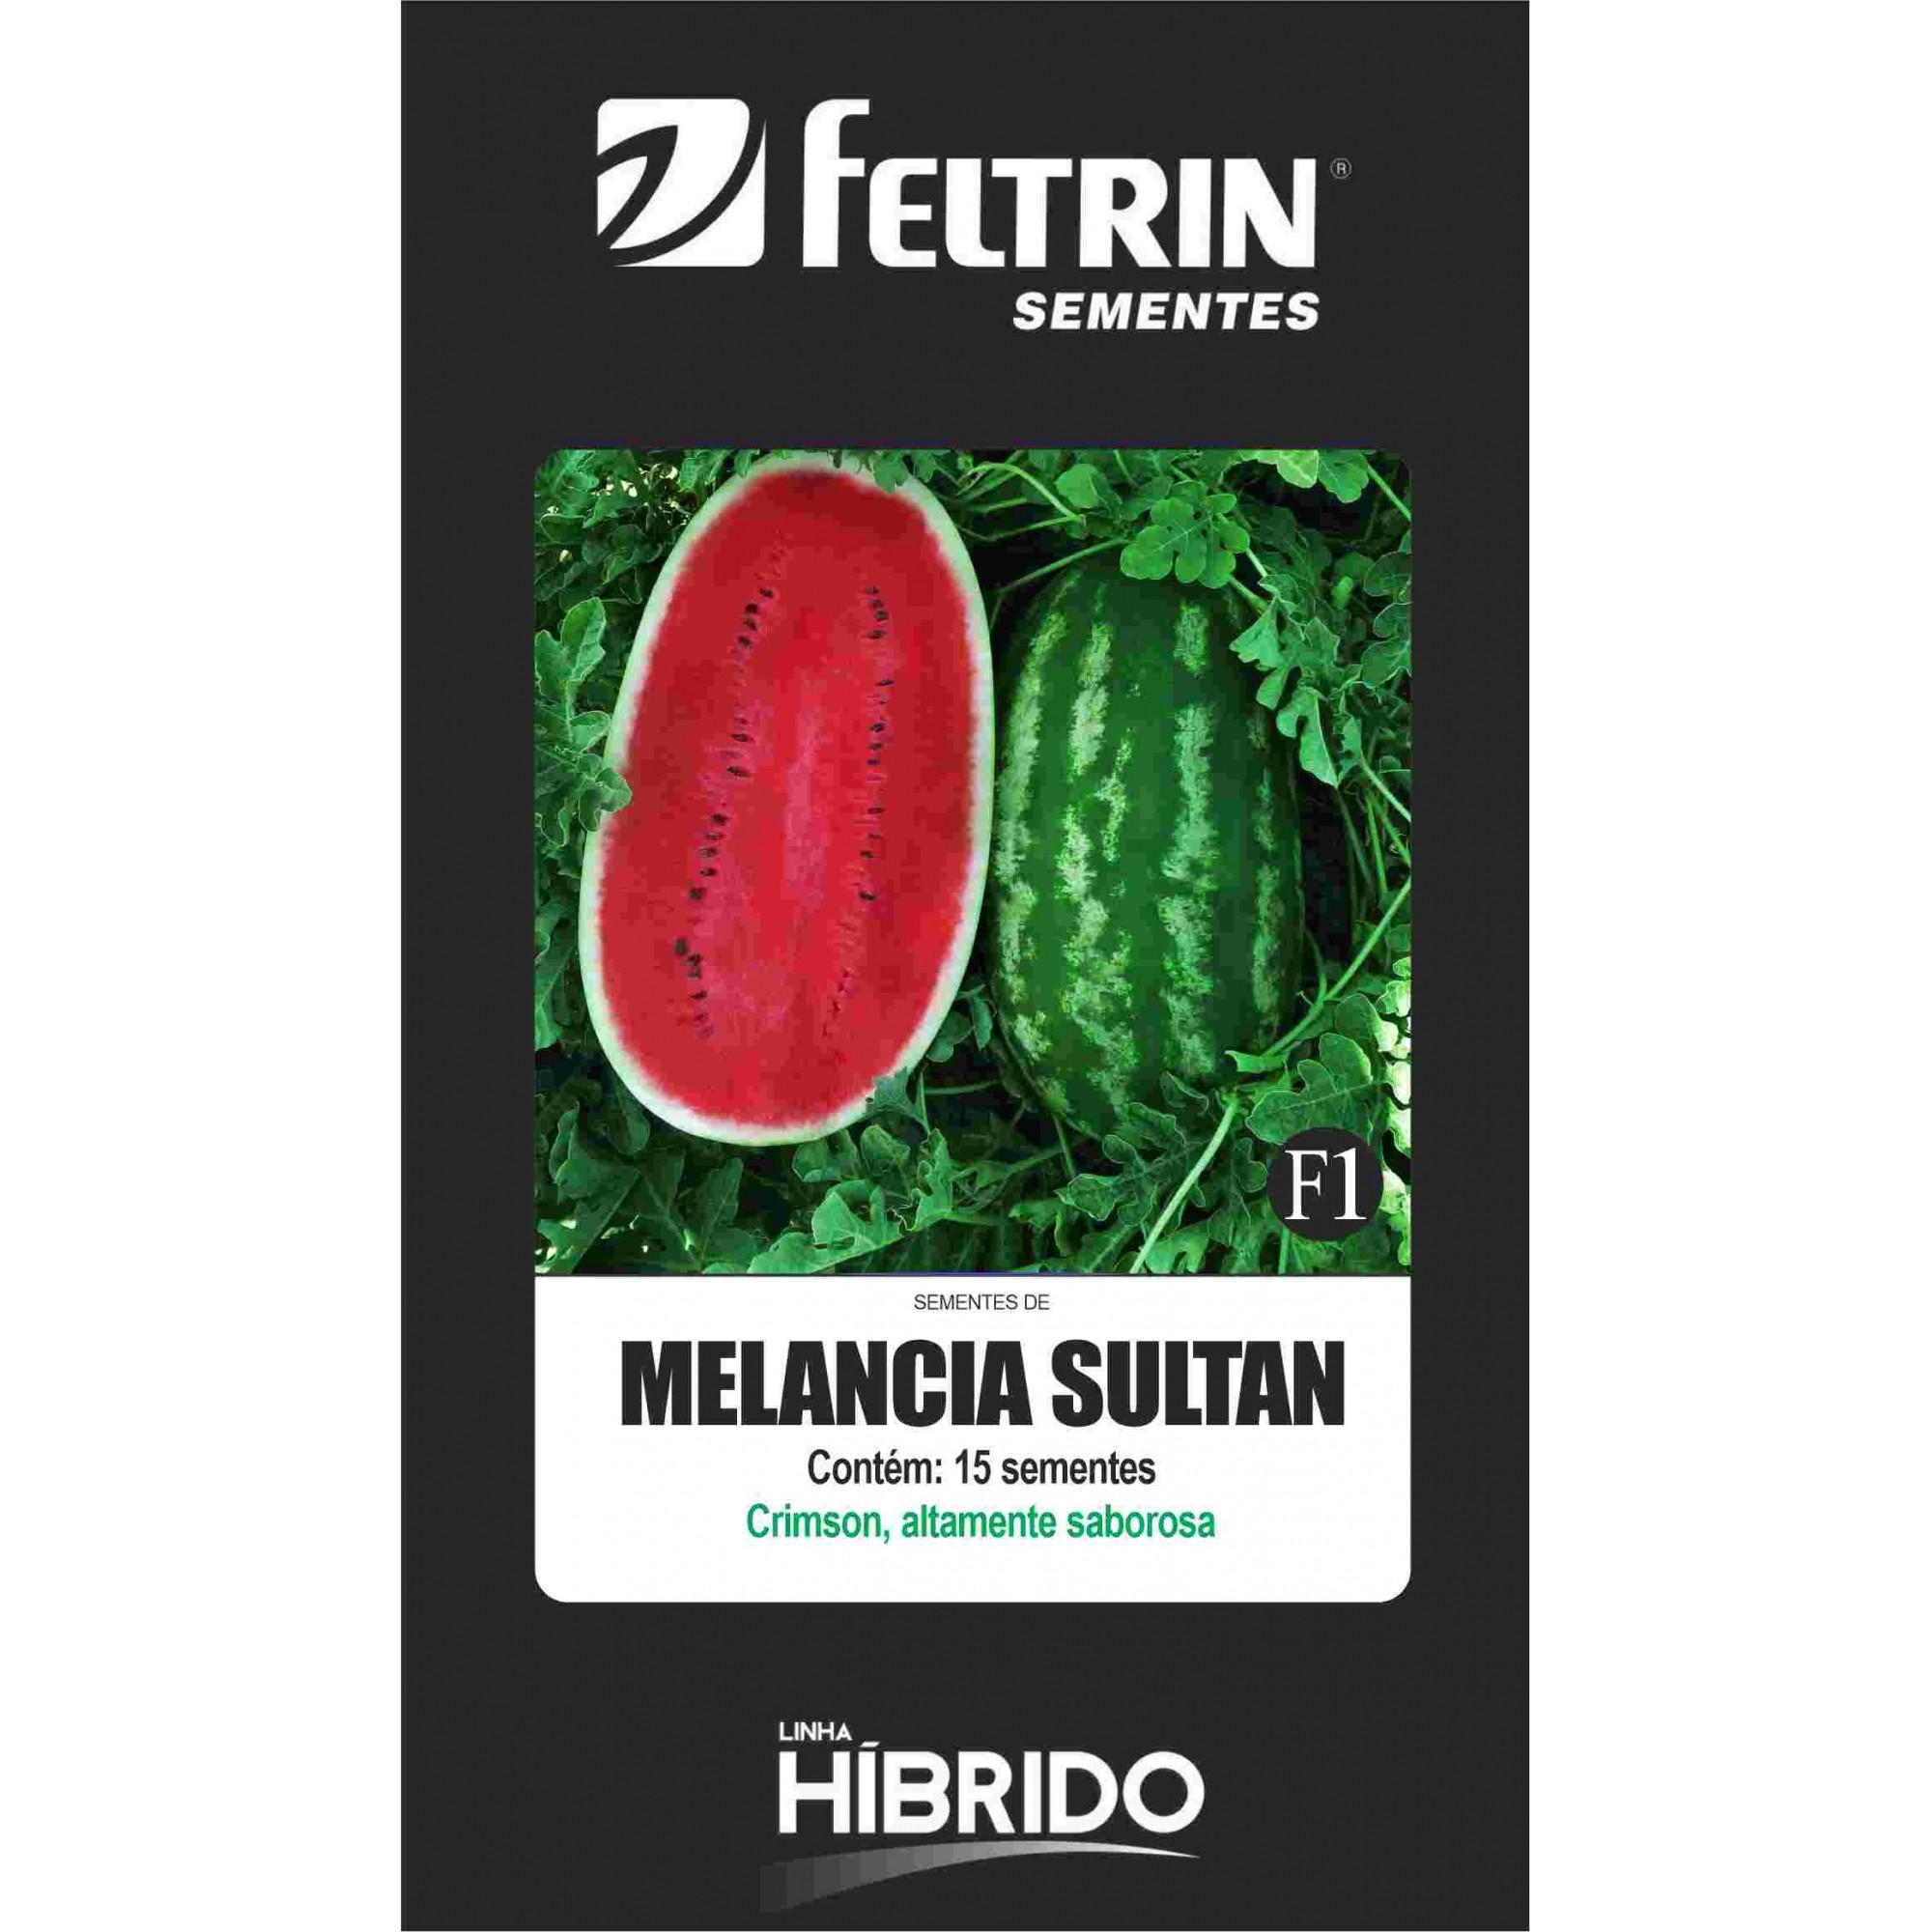 Melancia Sultan - contém 15 sementes